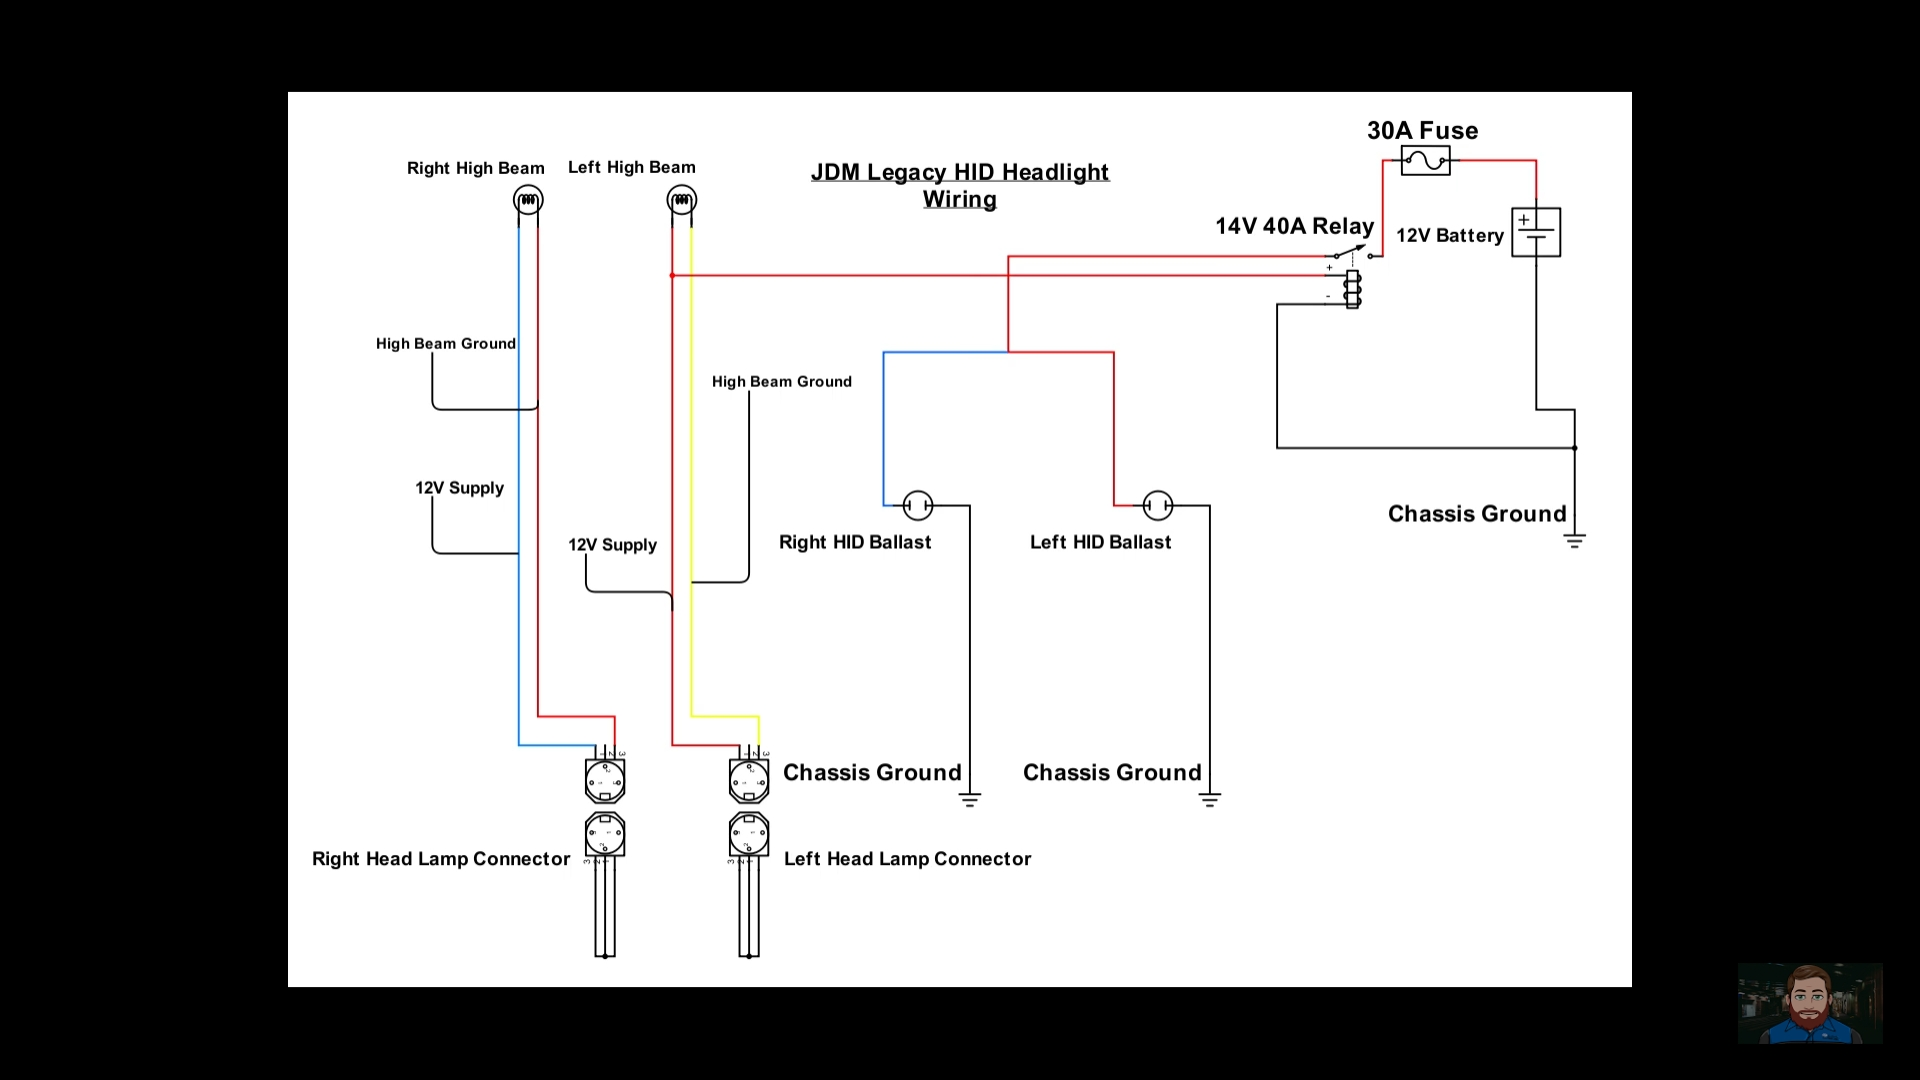 Legacy Headlight Wiring Diagram For 2003 Bmw E90 Wiring Diagrams Online Wiring Diagram Schematics